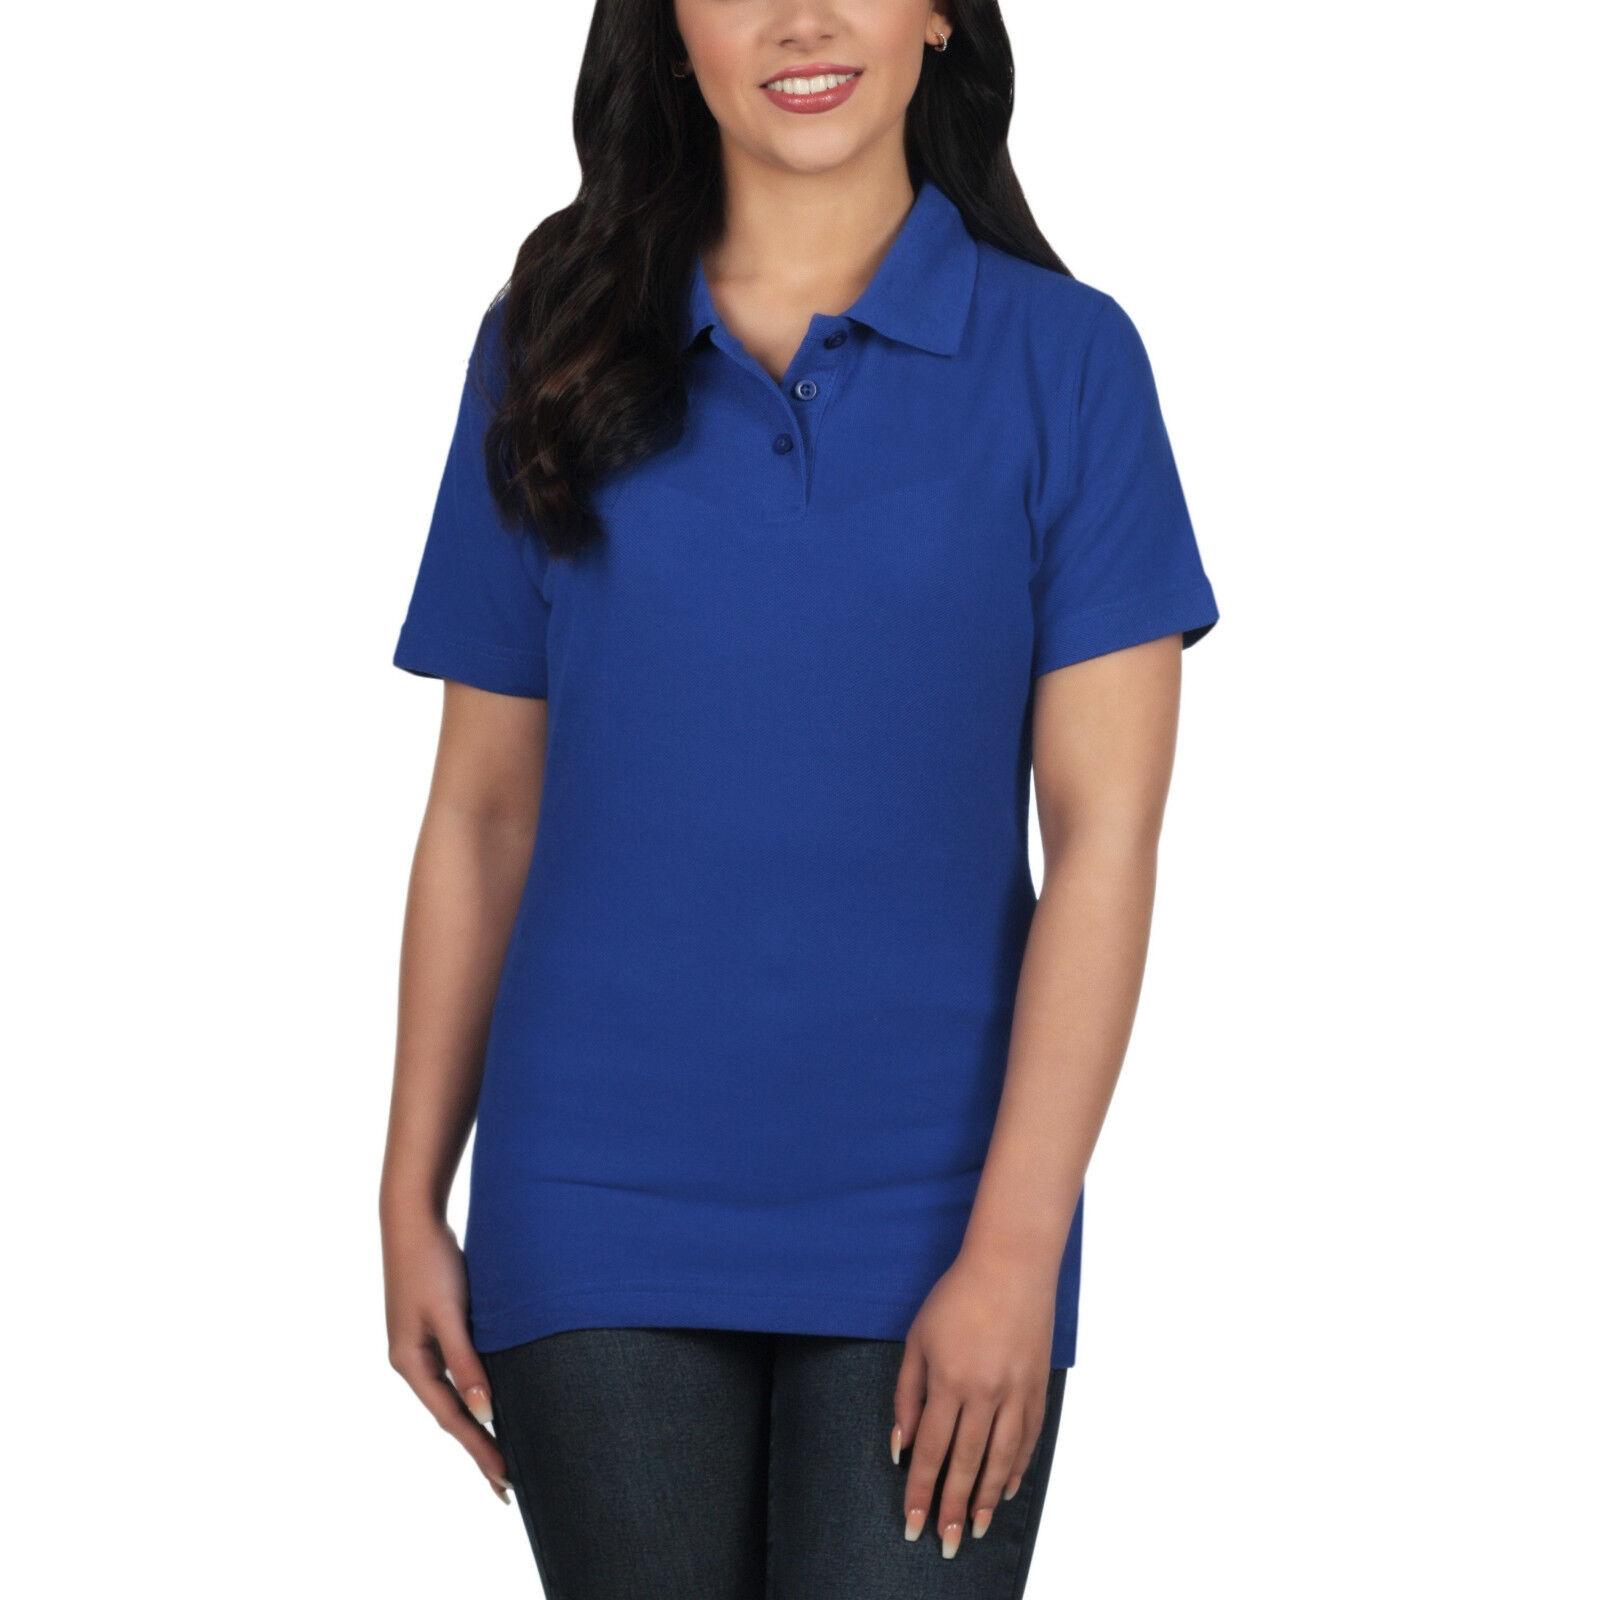 526ea9d18993 Ladies Polo Shirt Short Sleeve Womens Plain Pique Classic Top T ...